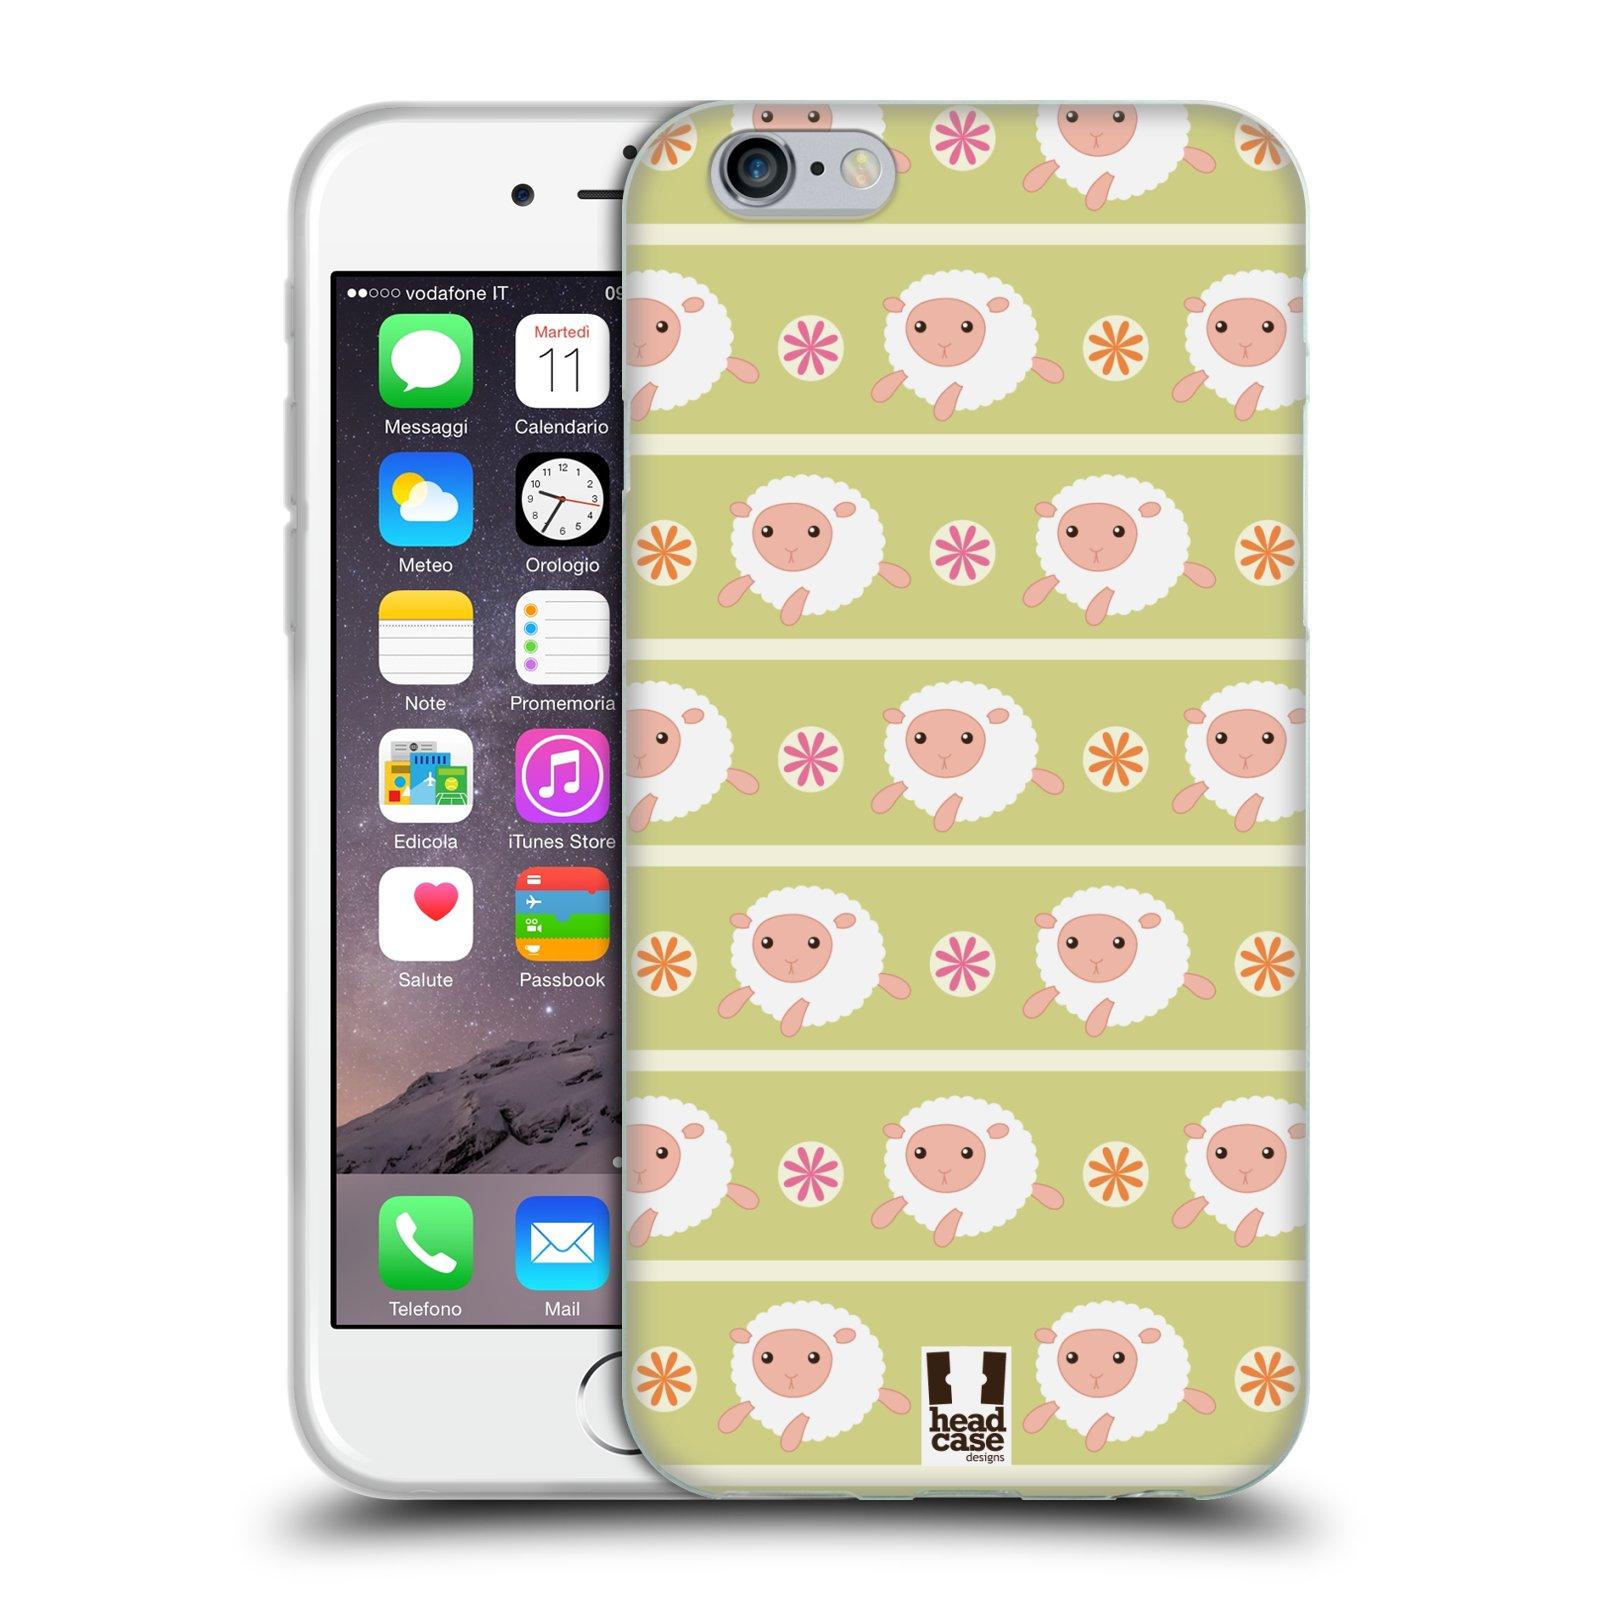 HEAD CASE silikonový obal na mobil Apple Iphone 6/6S vzor roztomilé zvířecí vzory ovečky